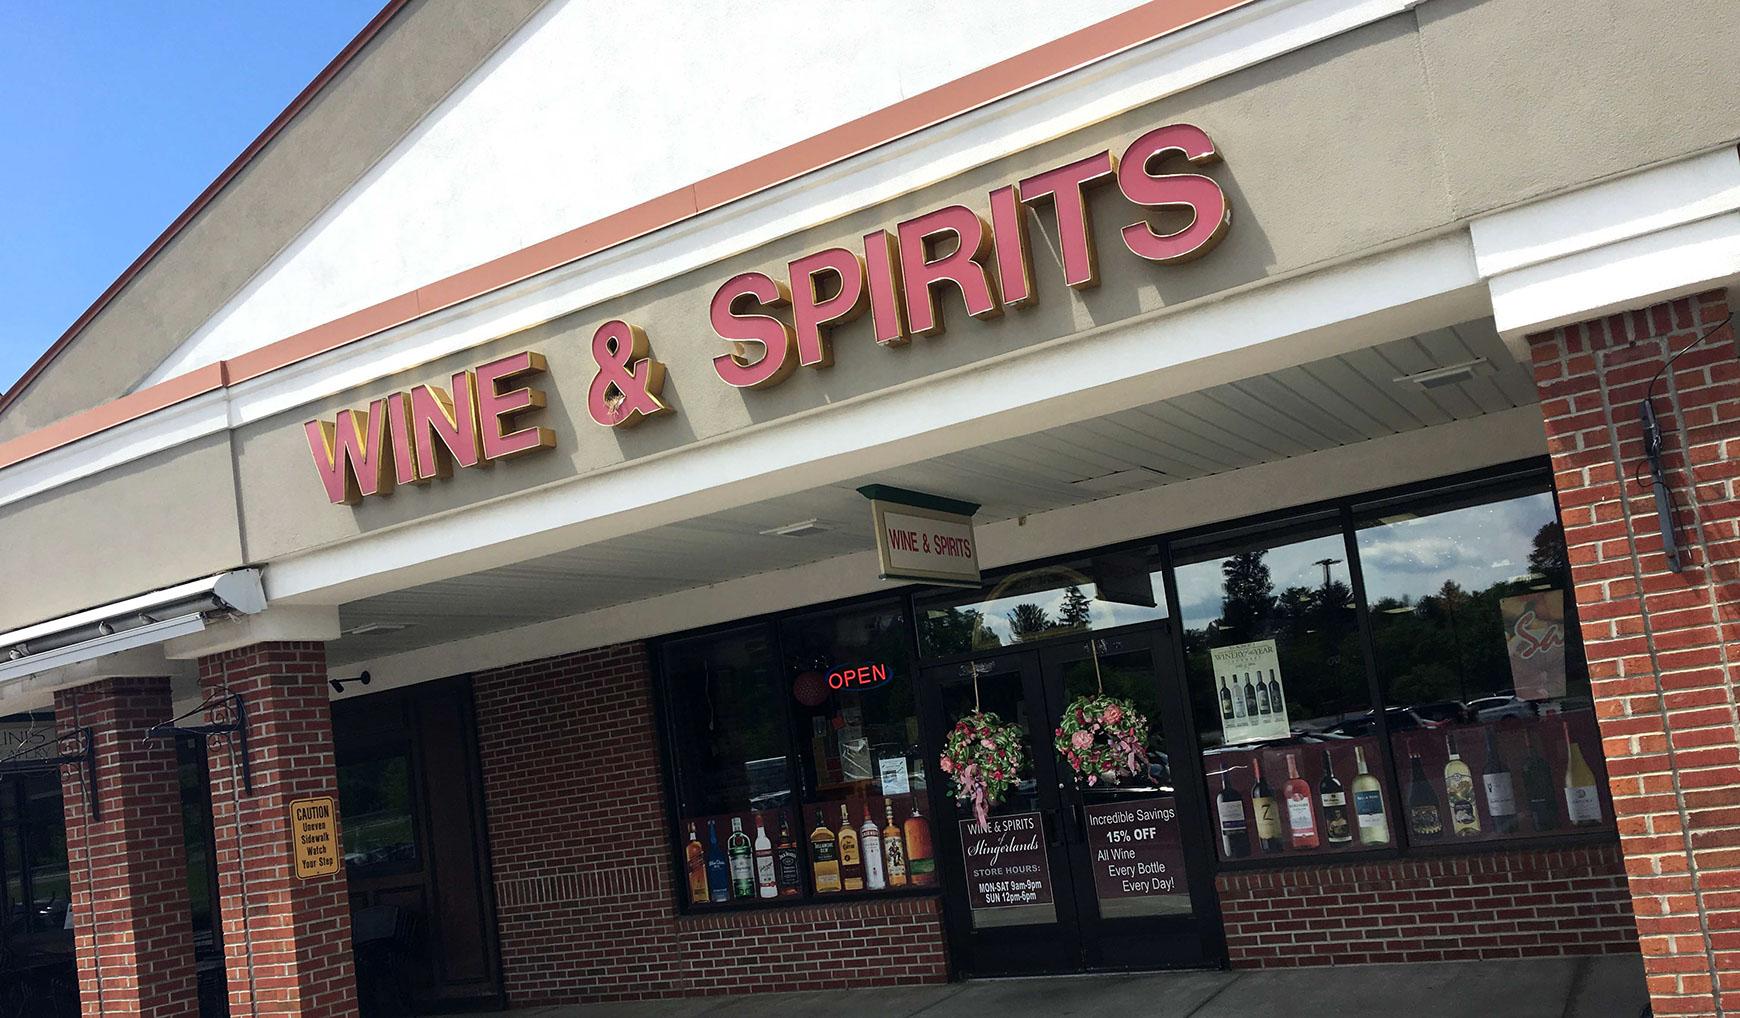 Wine & Spirits in the Price Chopper Plaza, Slingerlands